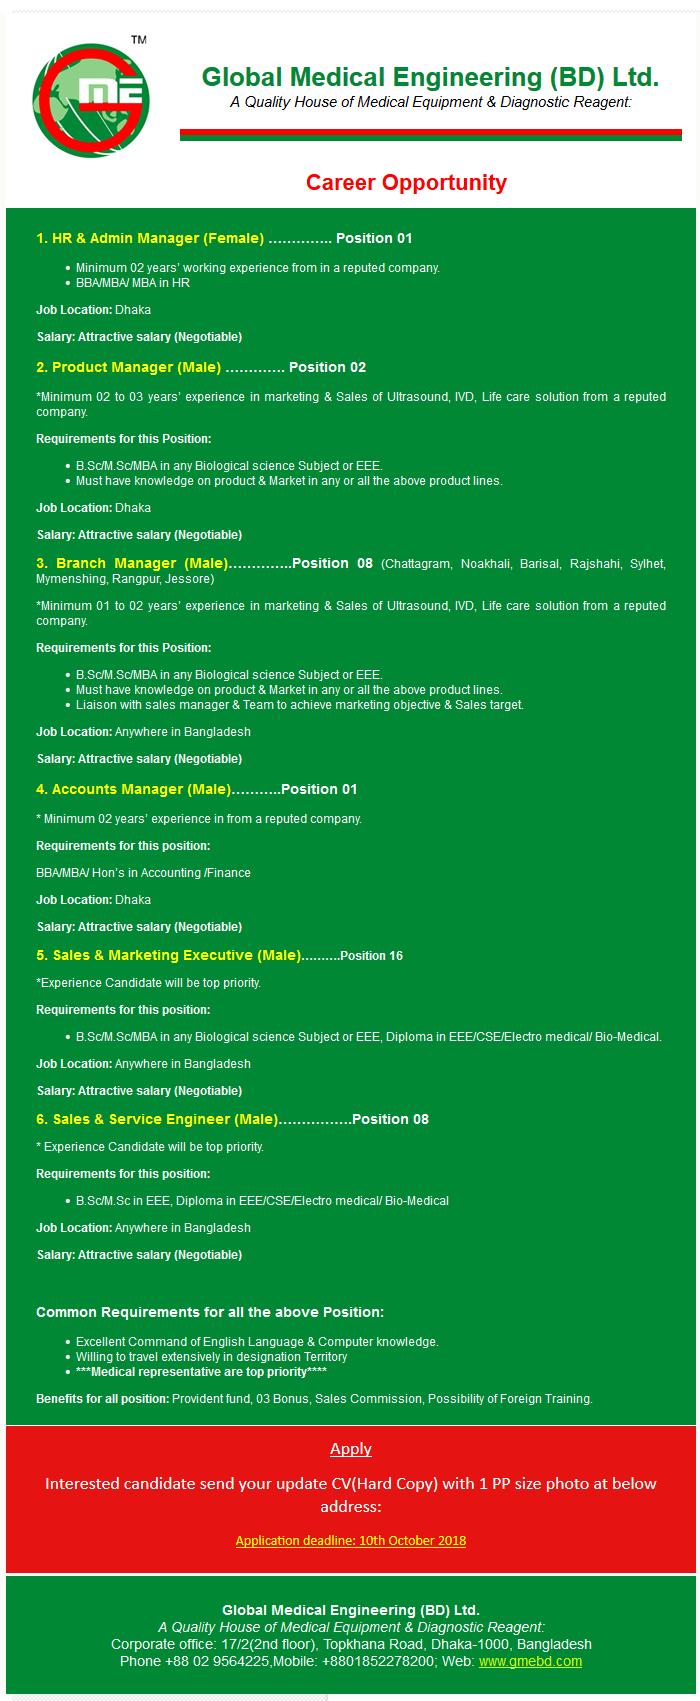 Global Medical Engineering (BD) Ltd Job Circular 2018